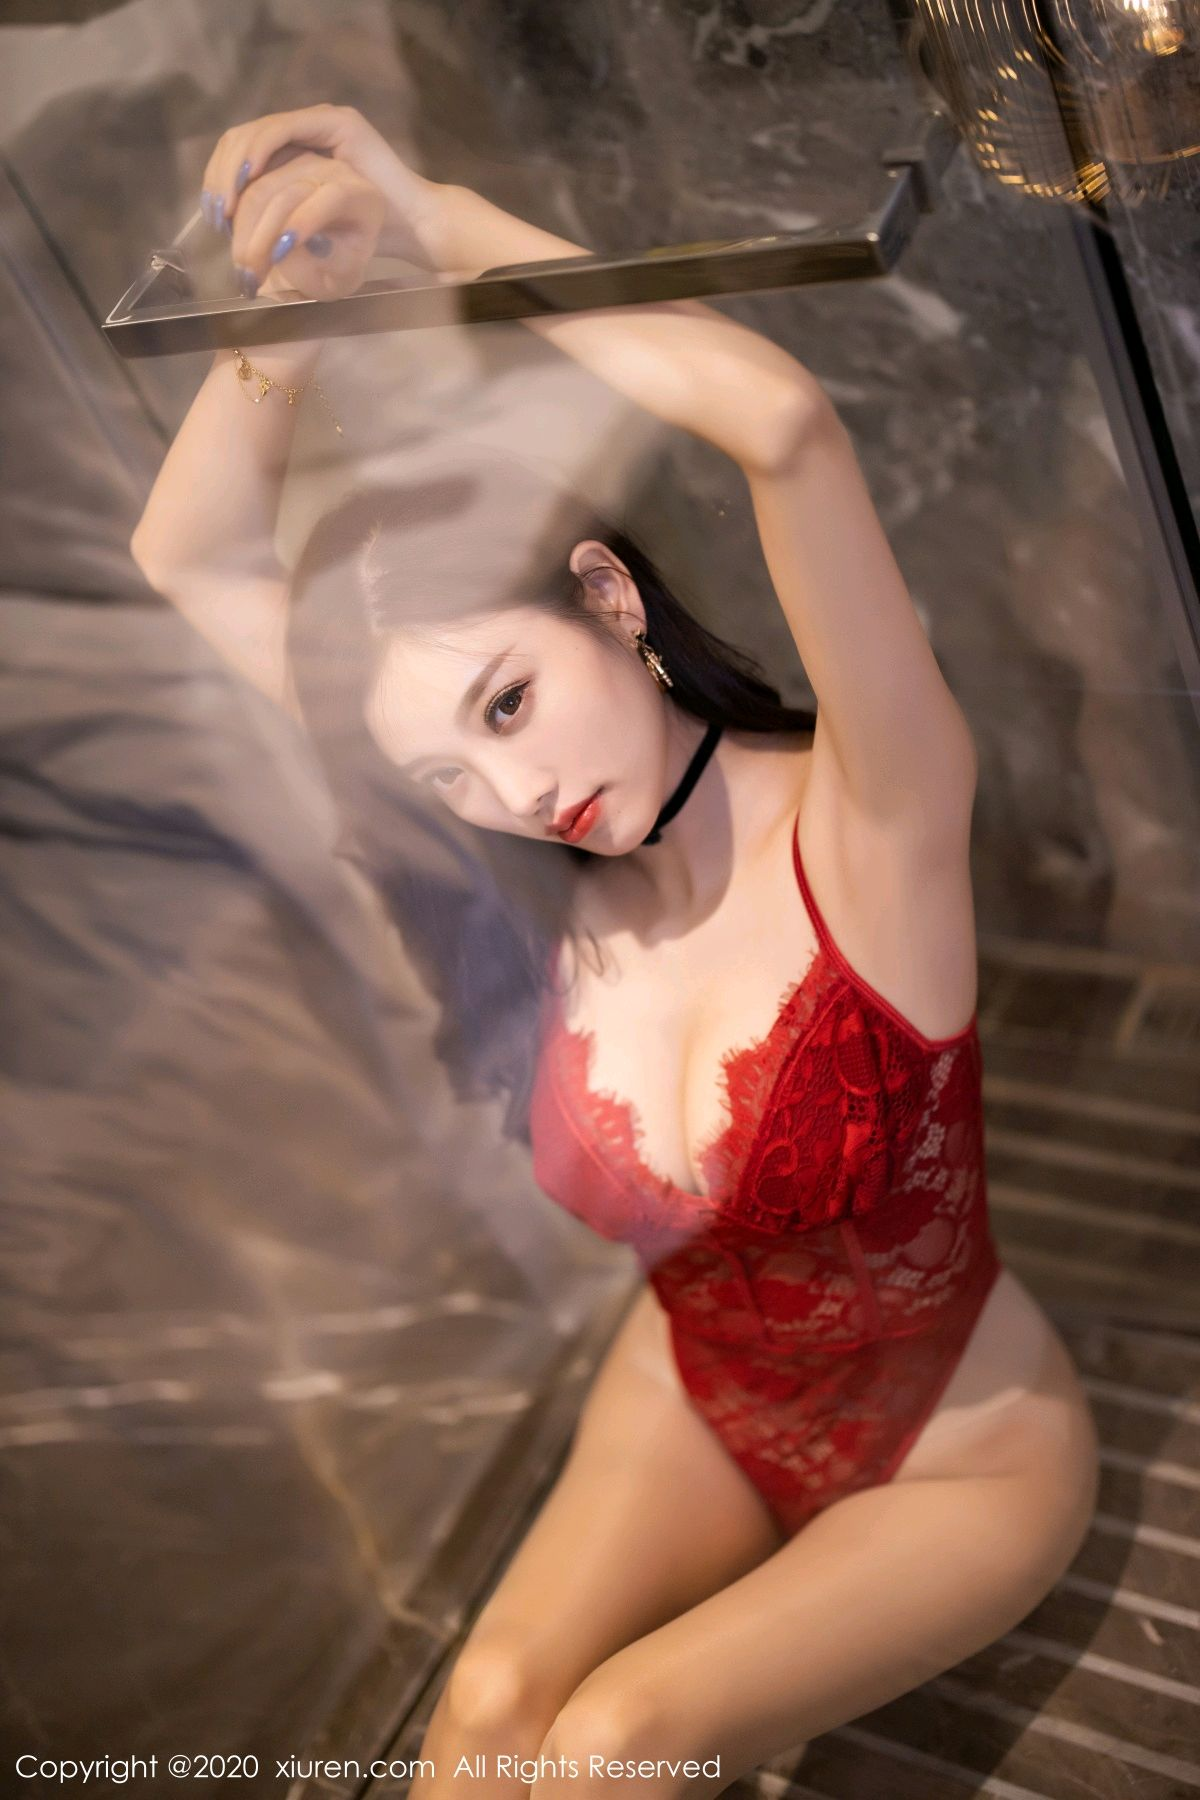 [XiuRen] Vol.2671 Yang Chen Chen 49P, Underwear, Xiuren, Yang Chen Chen